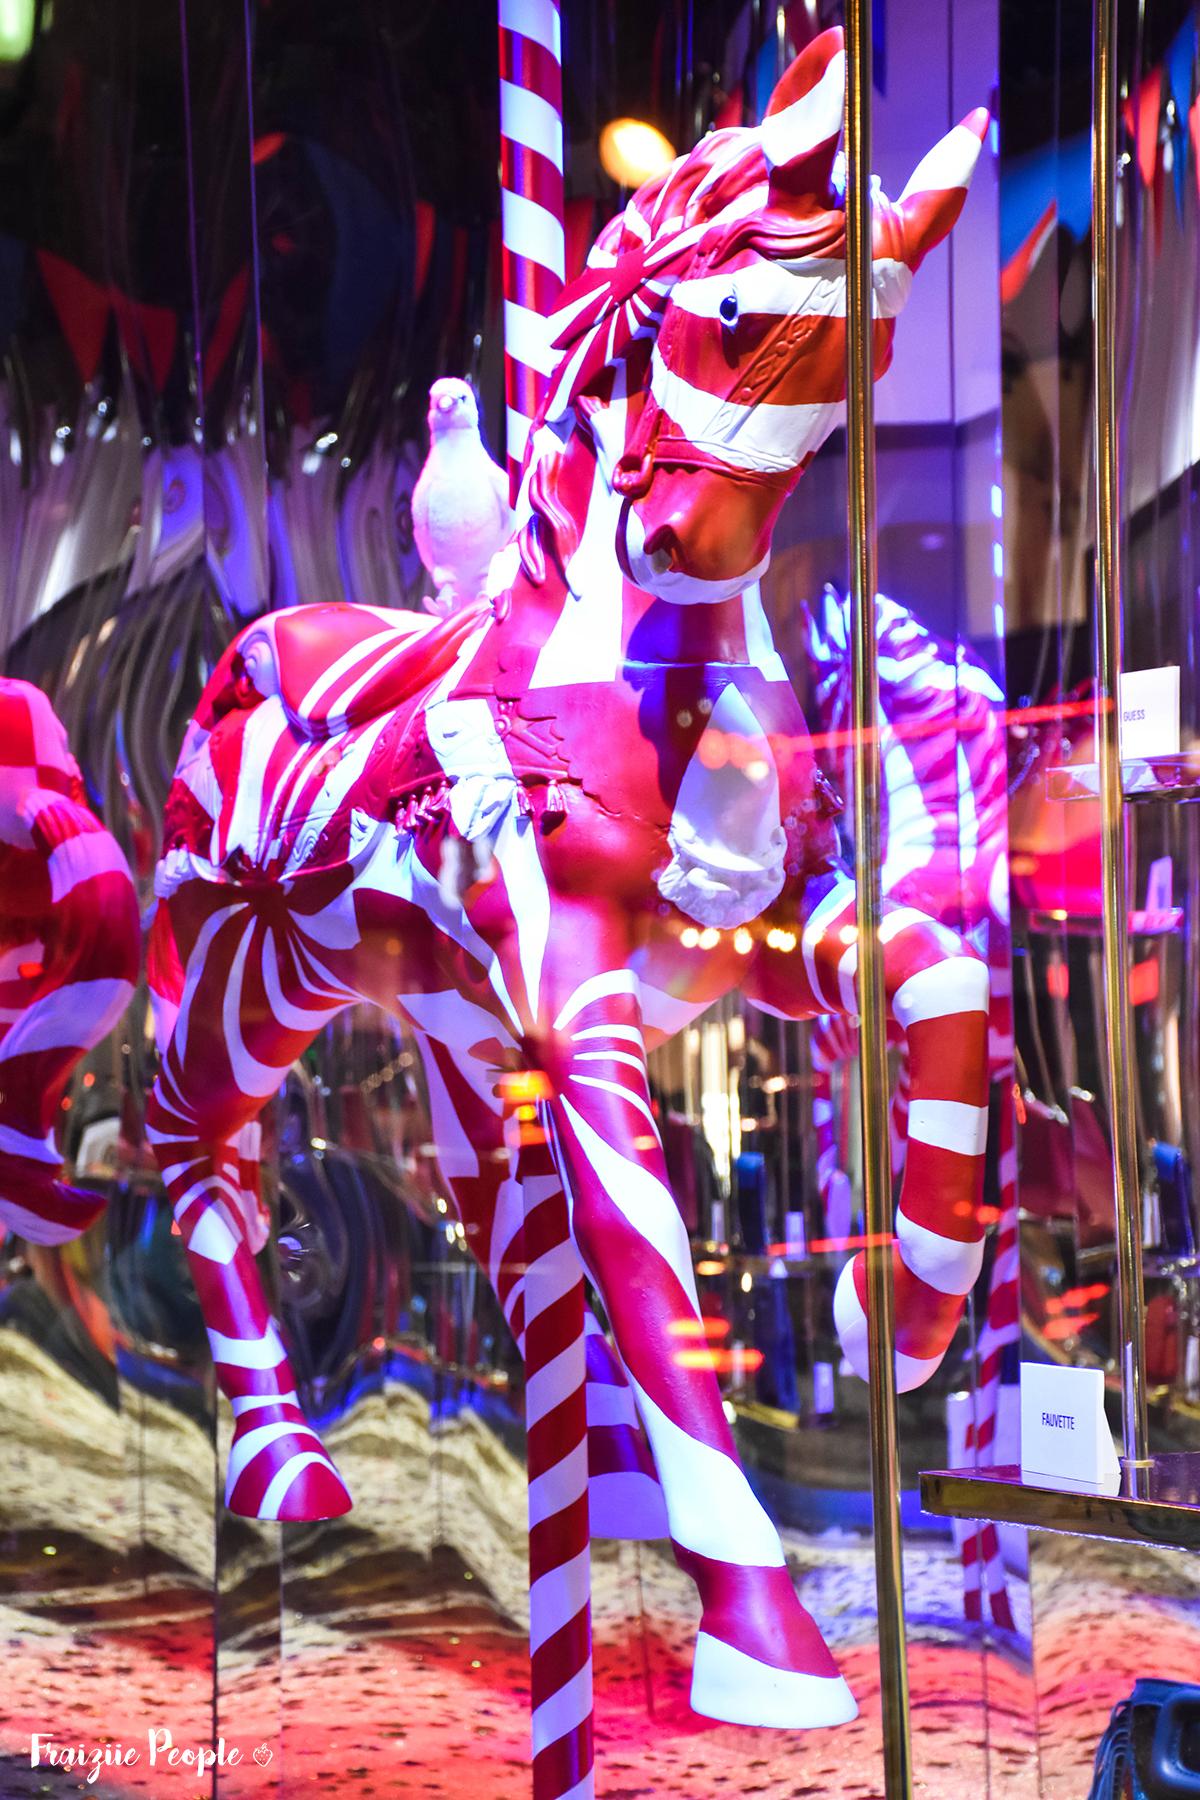 Vitrines de Noël des Galeries Lafayette - Fraiziie-People